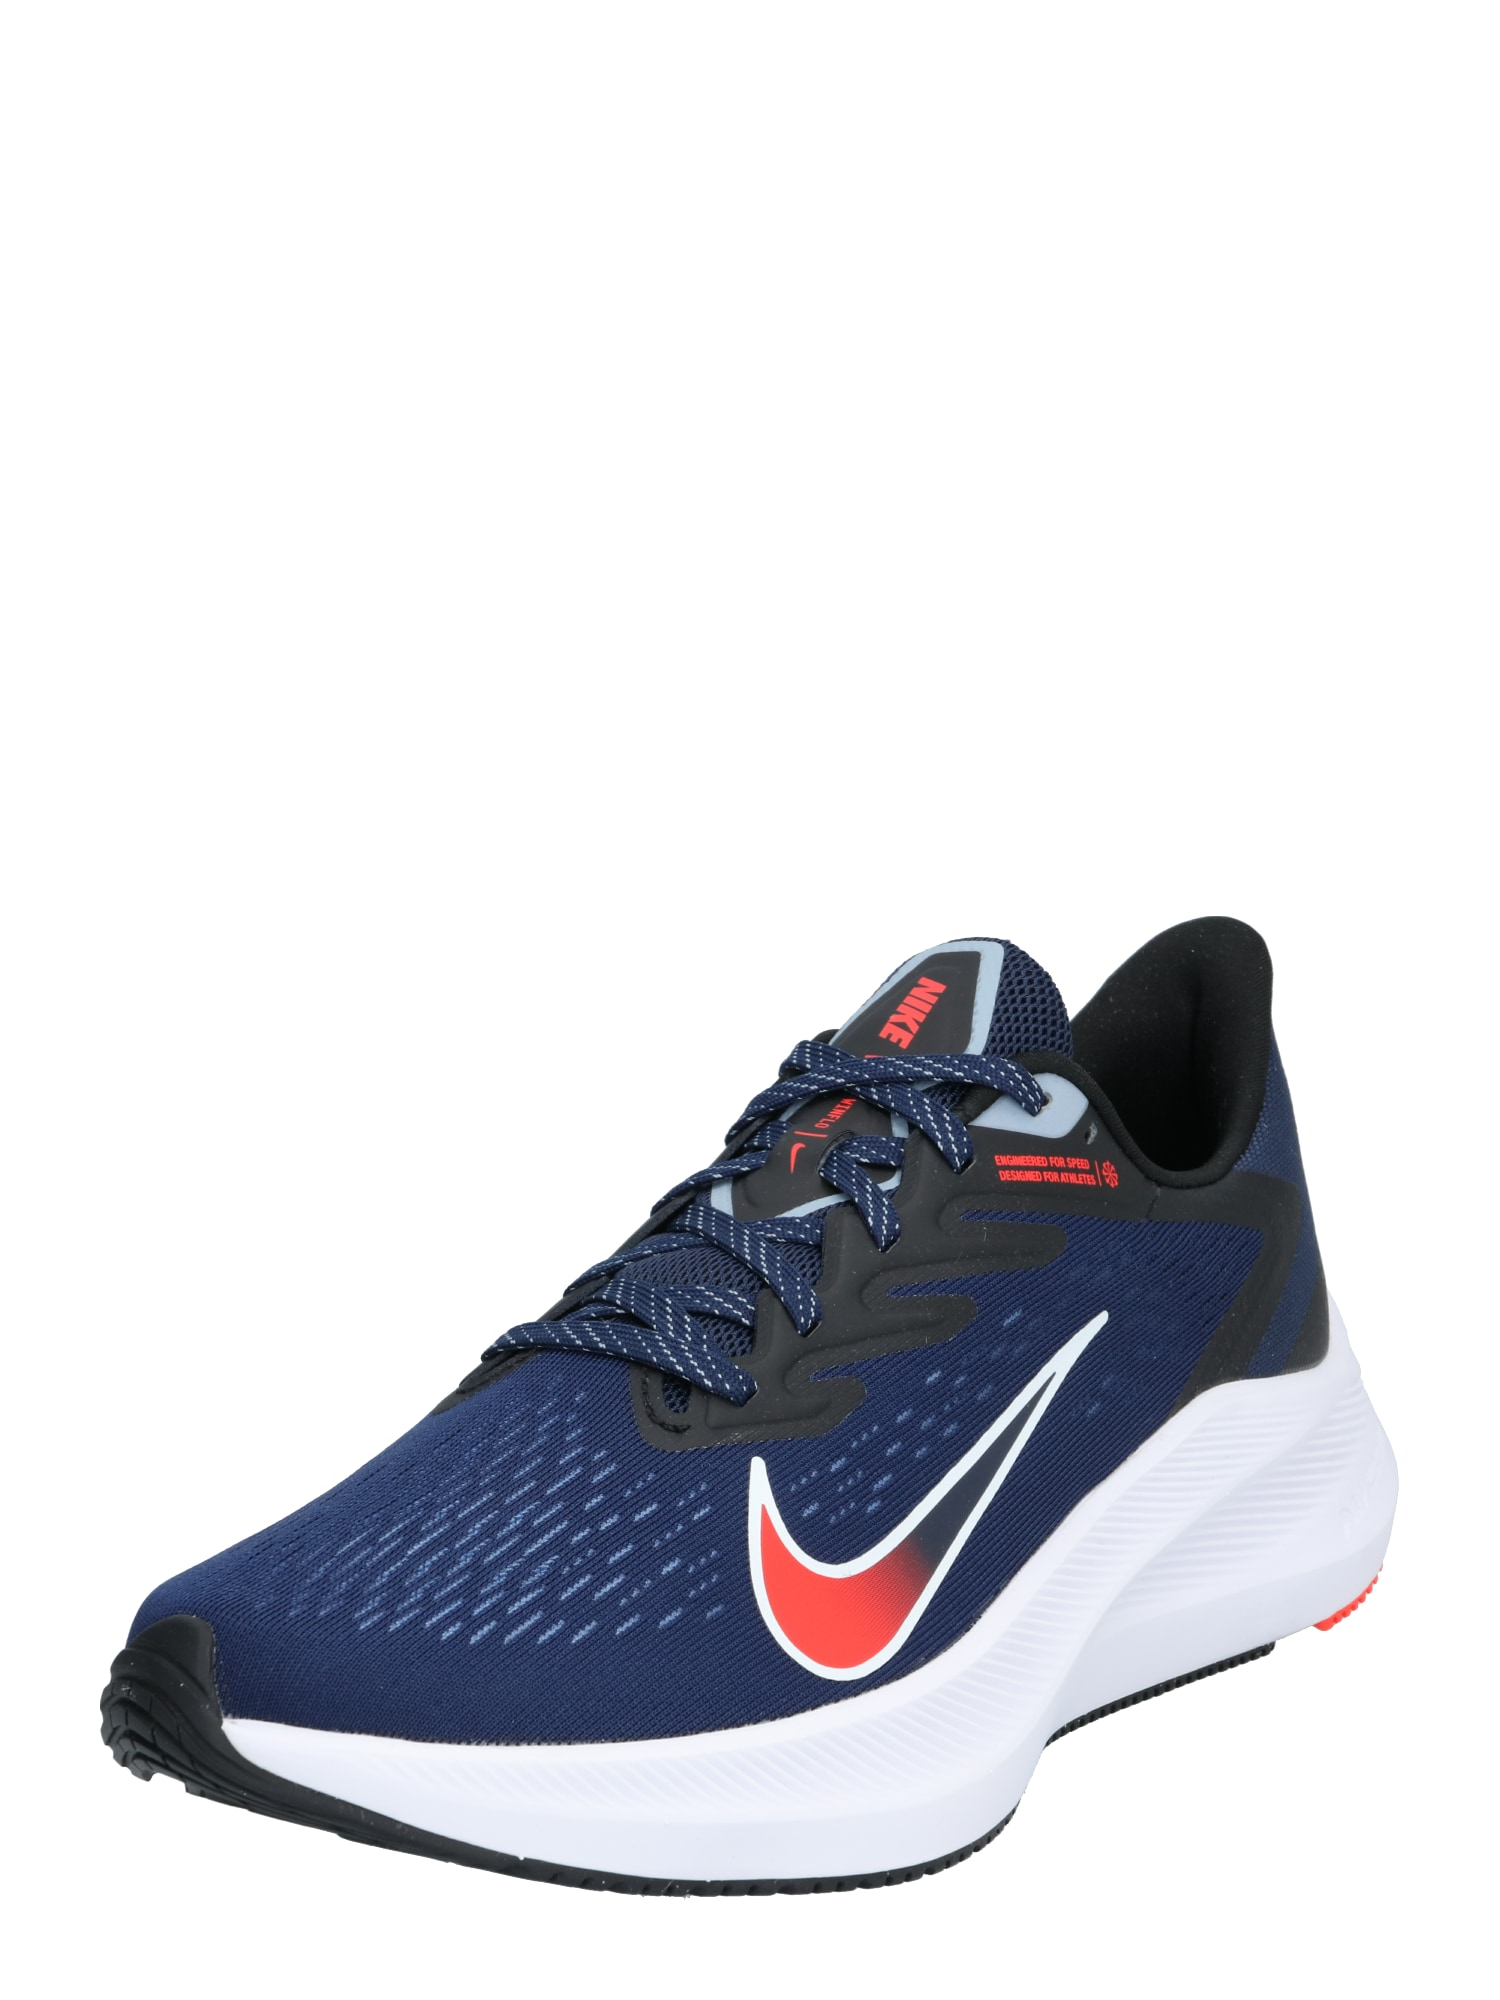 NIKE Bėgimo batai 'Zoom Winflo 7' tamsiai mėlyna